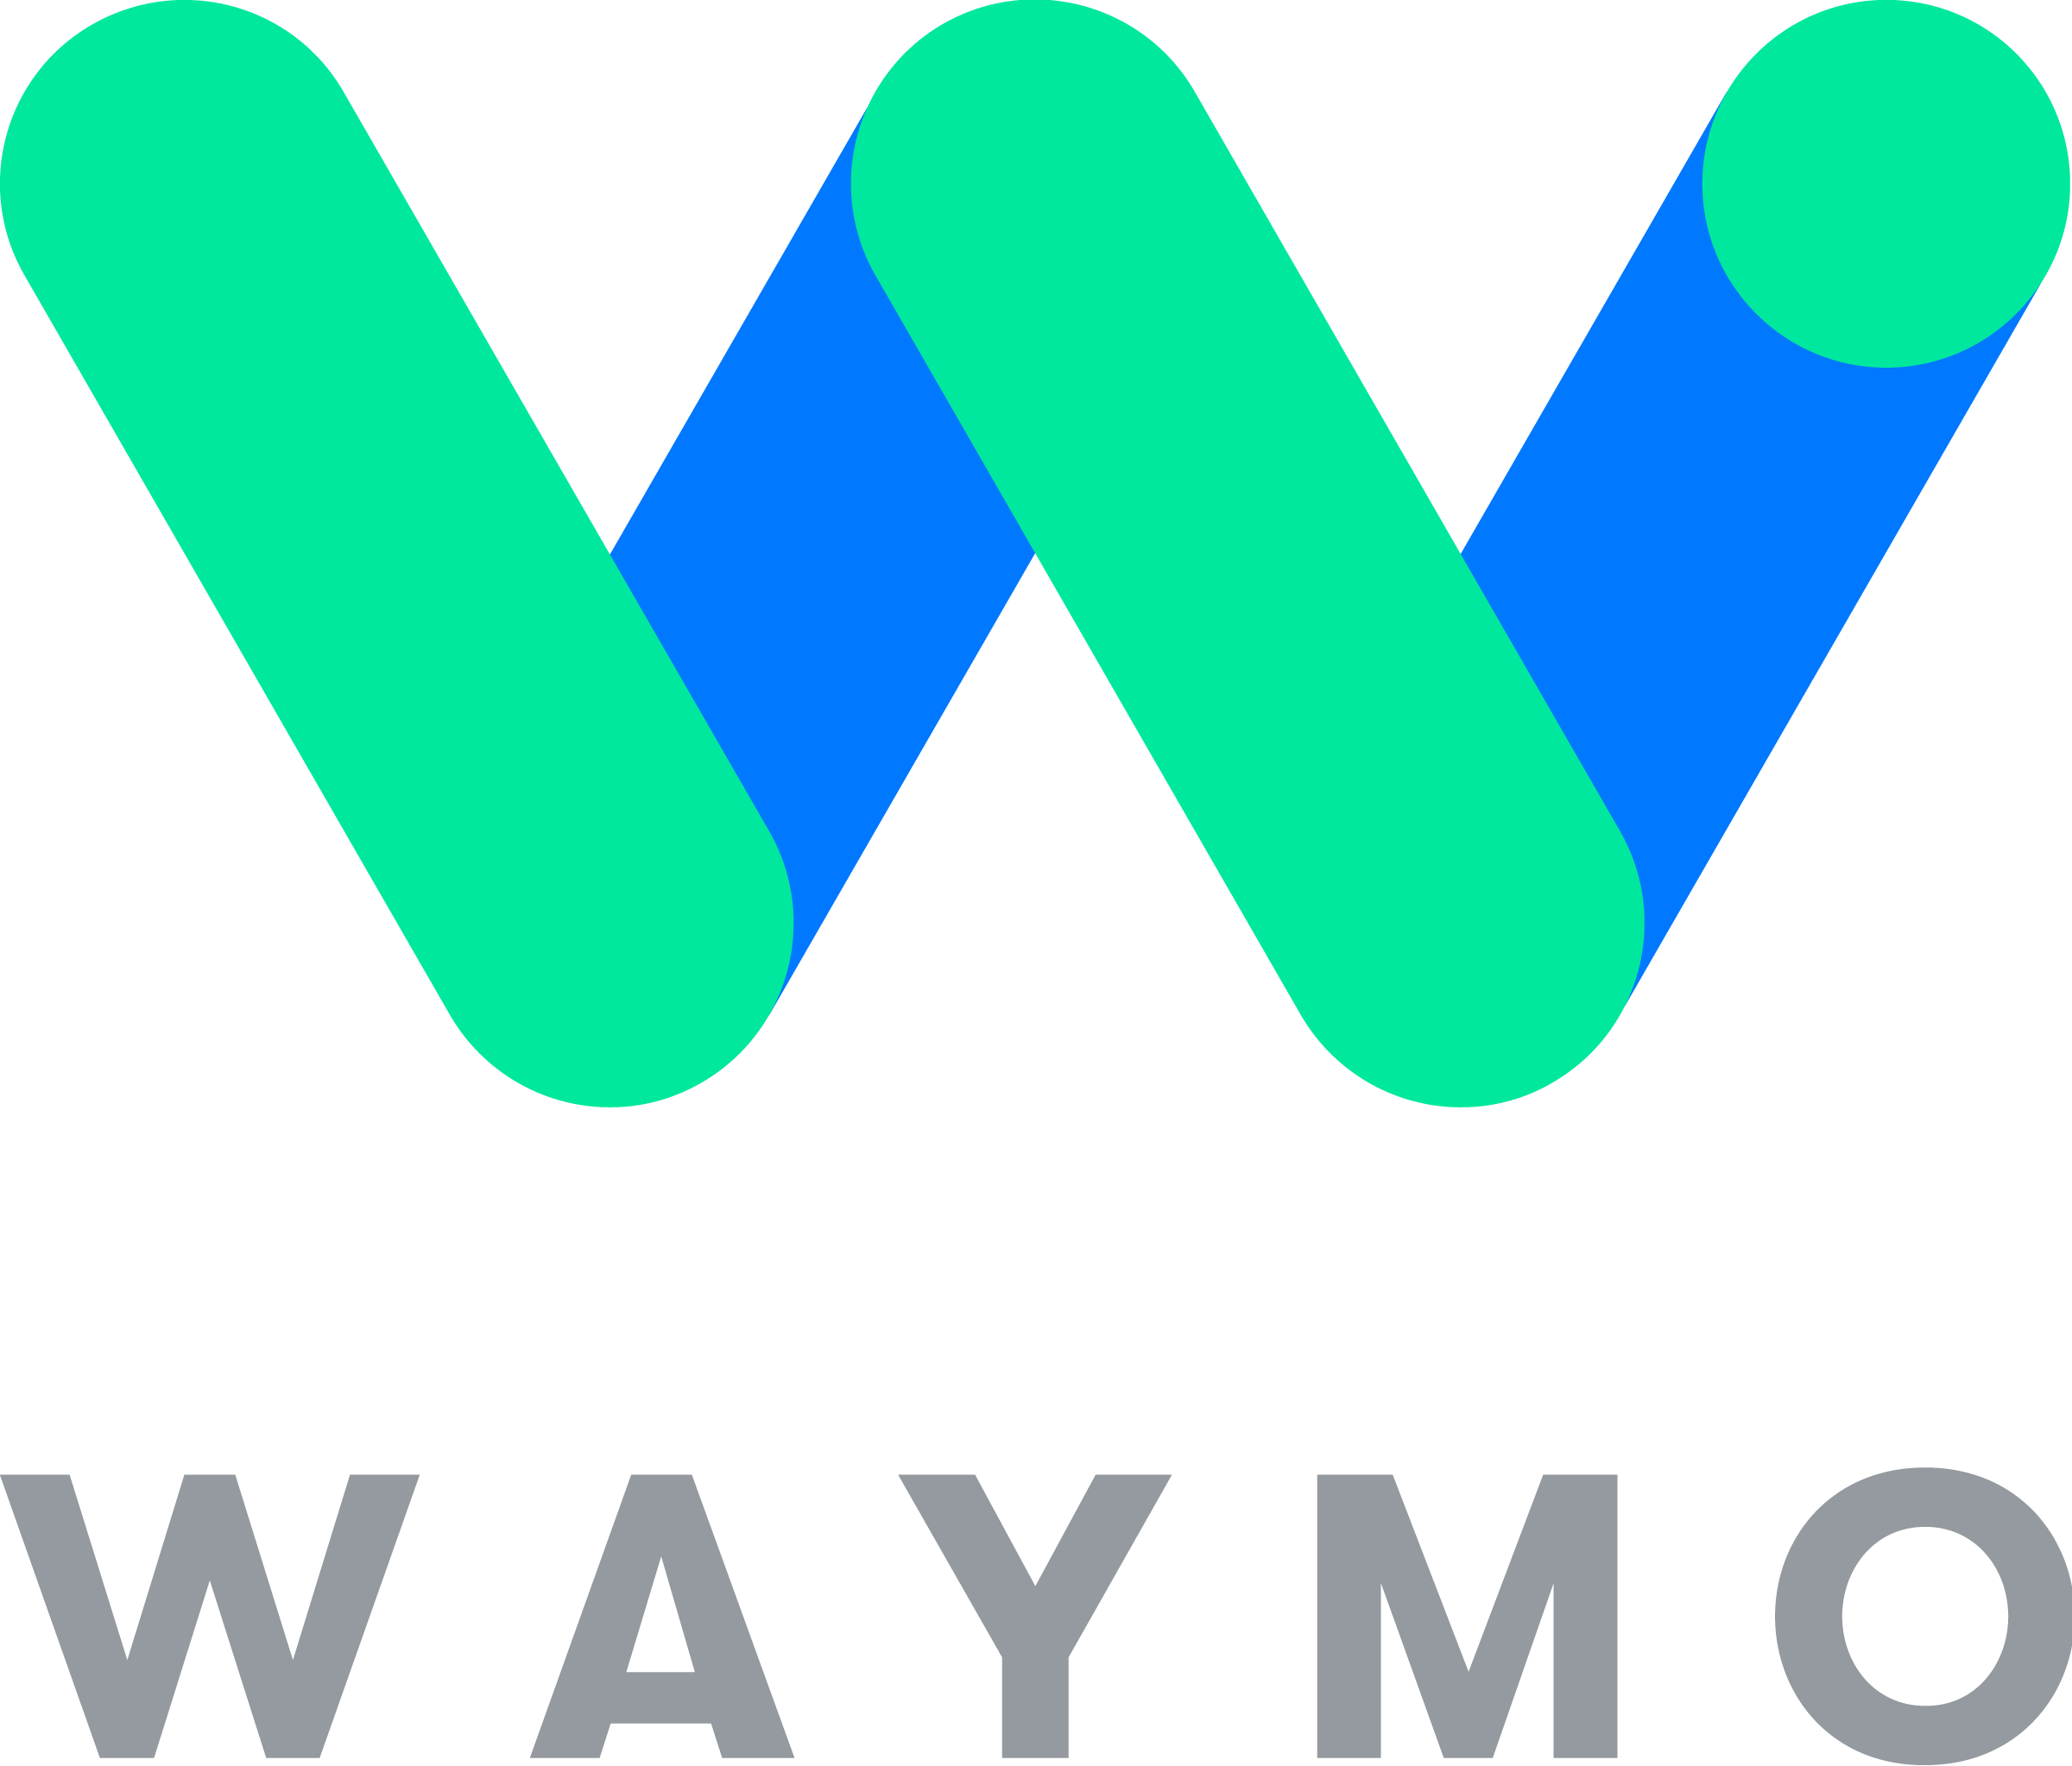 https://www.datapressepremium.com/rmupload/2005659/Image/Waymo.png